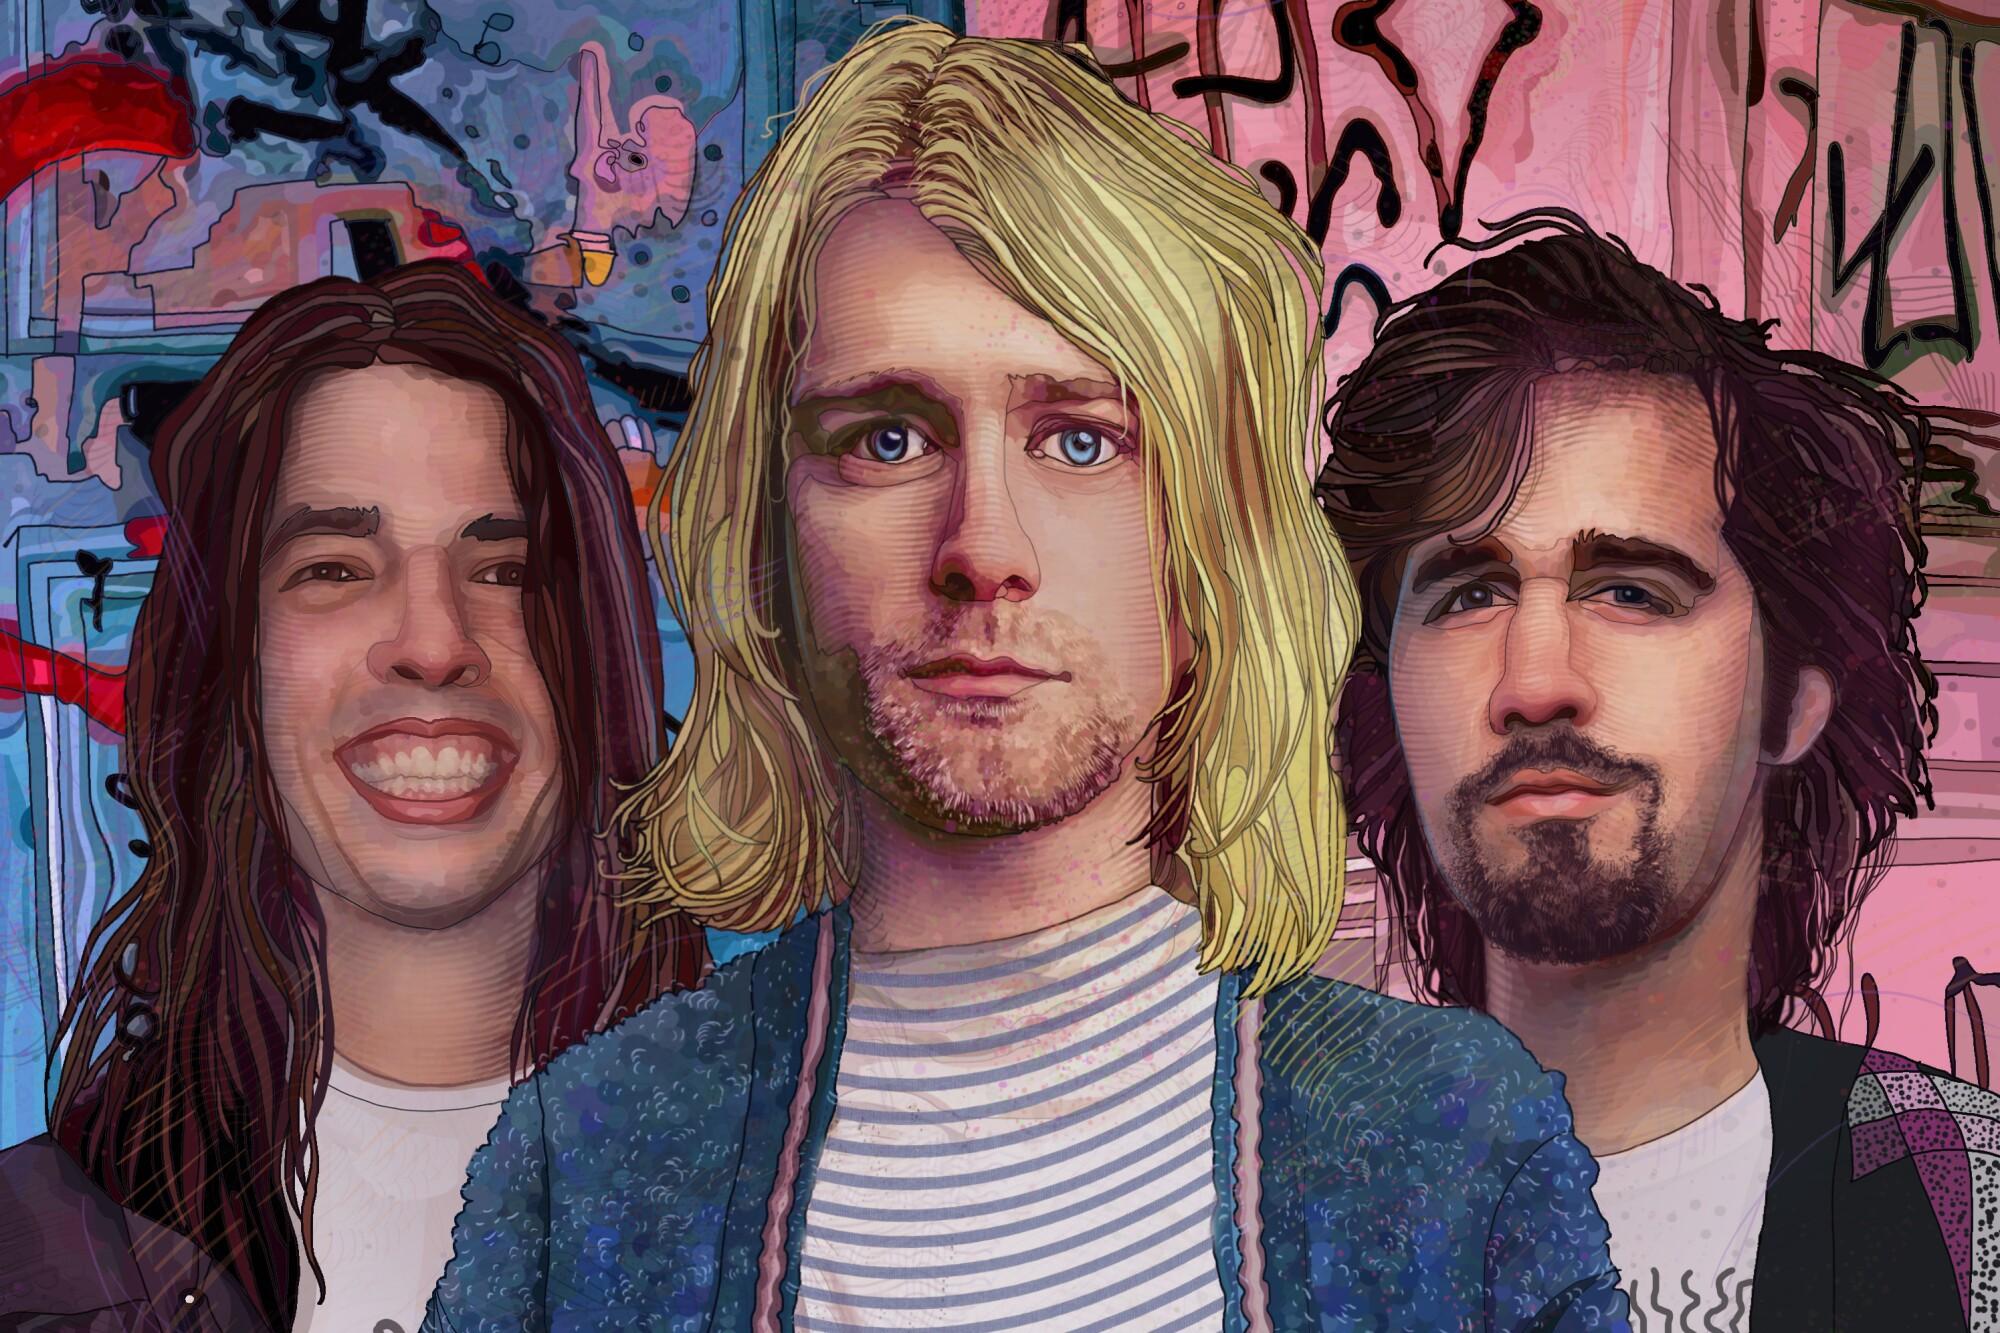 Illustration: From left, Nirvana's Dave Grohl, Kurt Cobain, and Krist Novoselic.